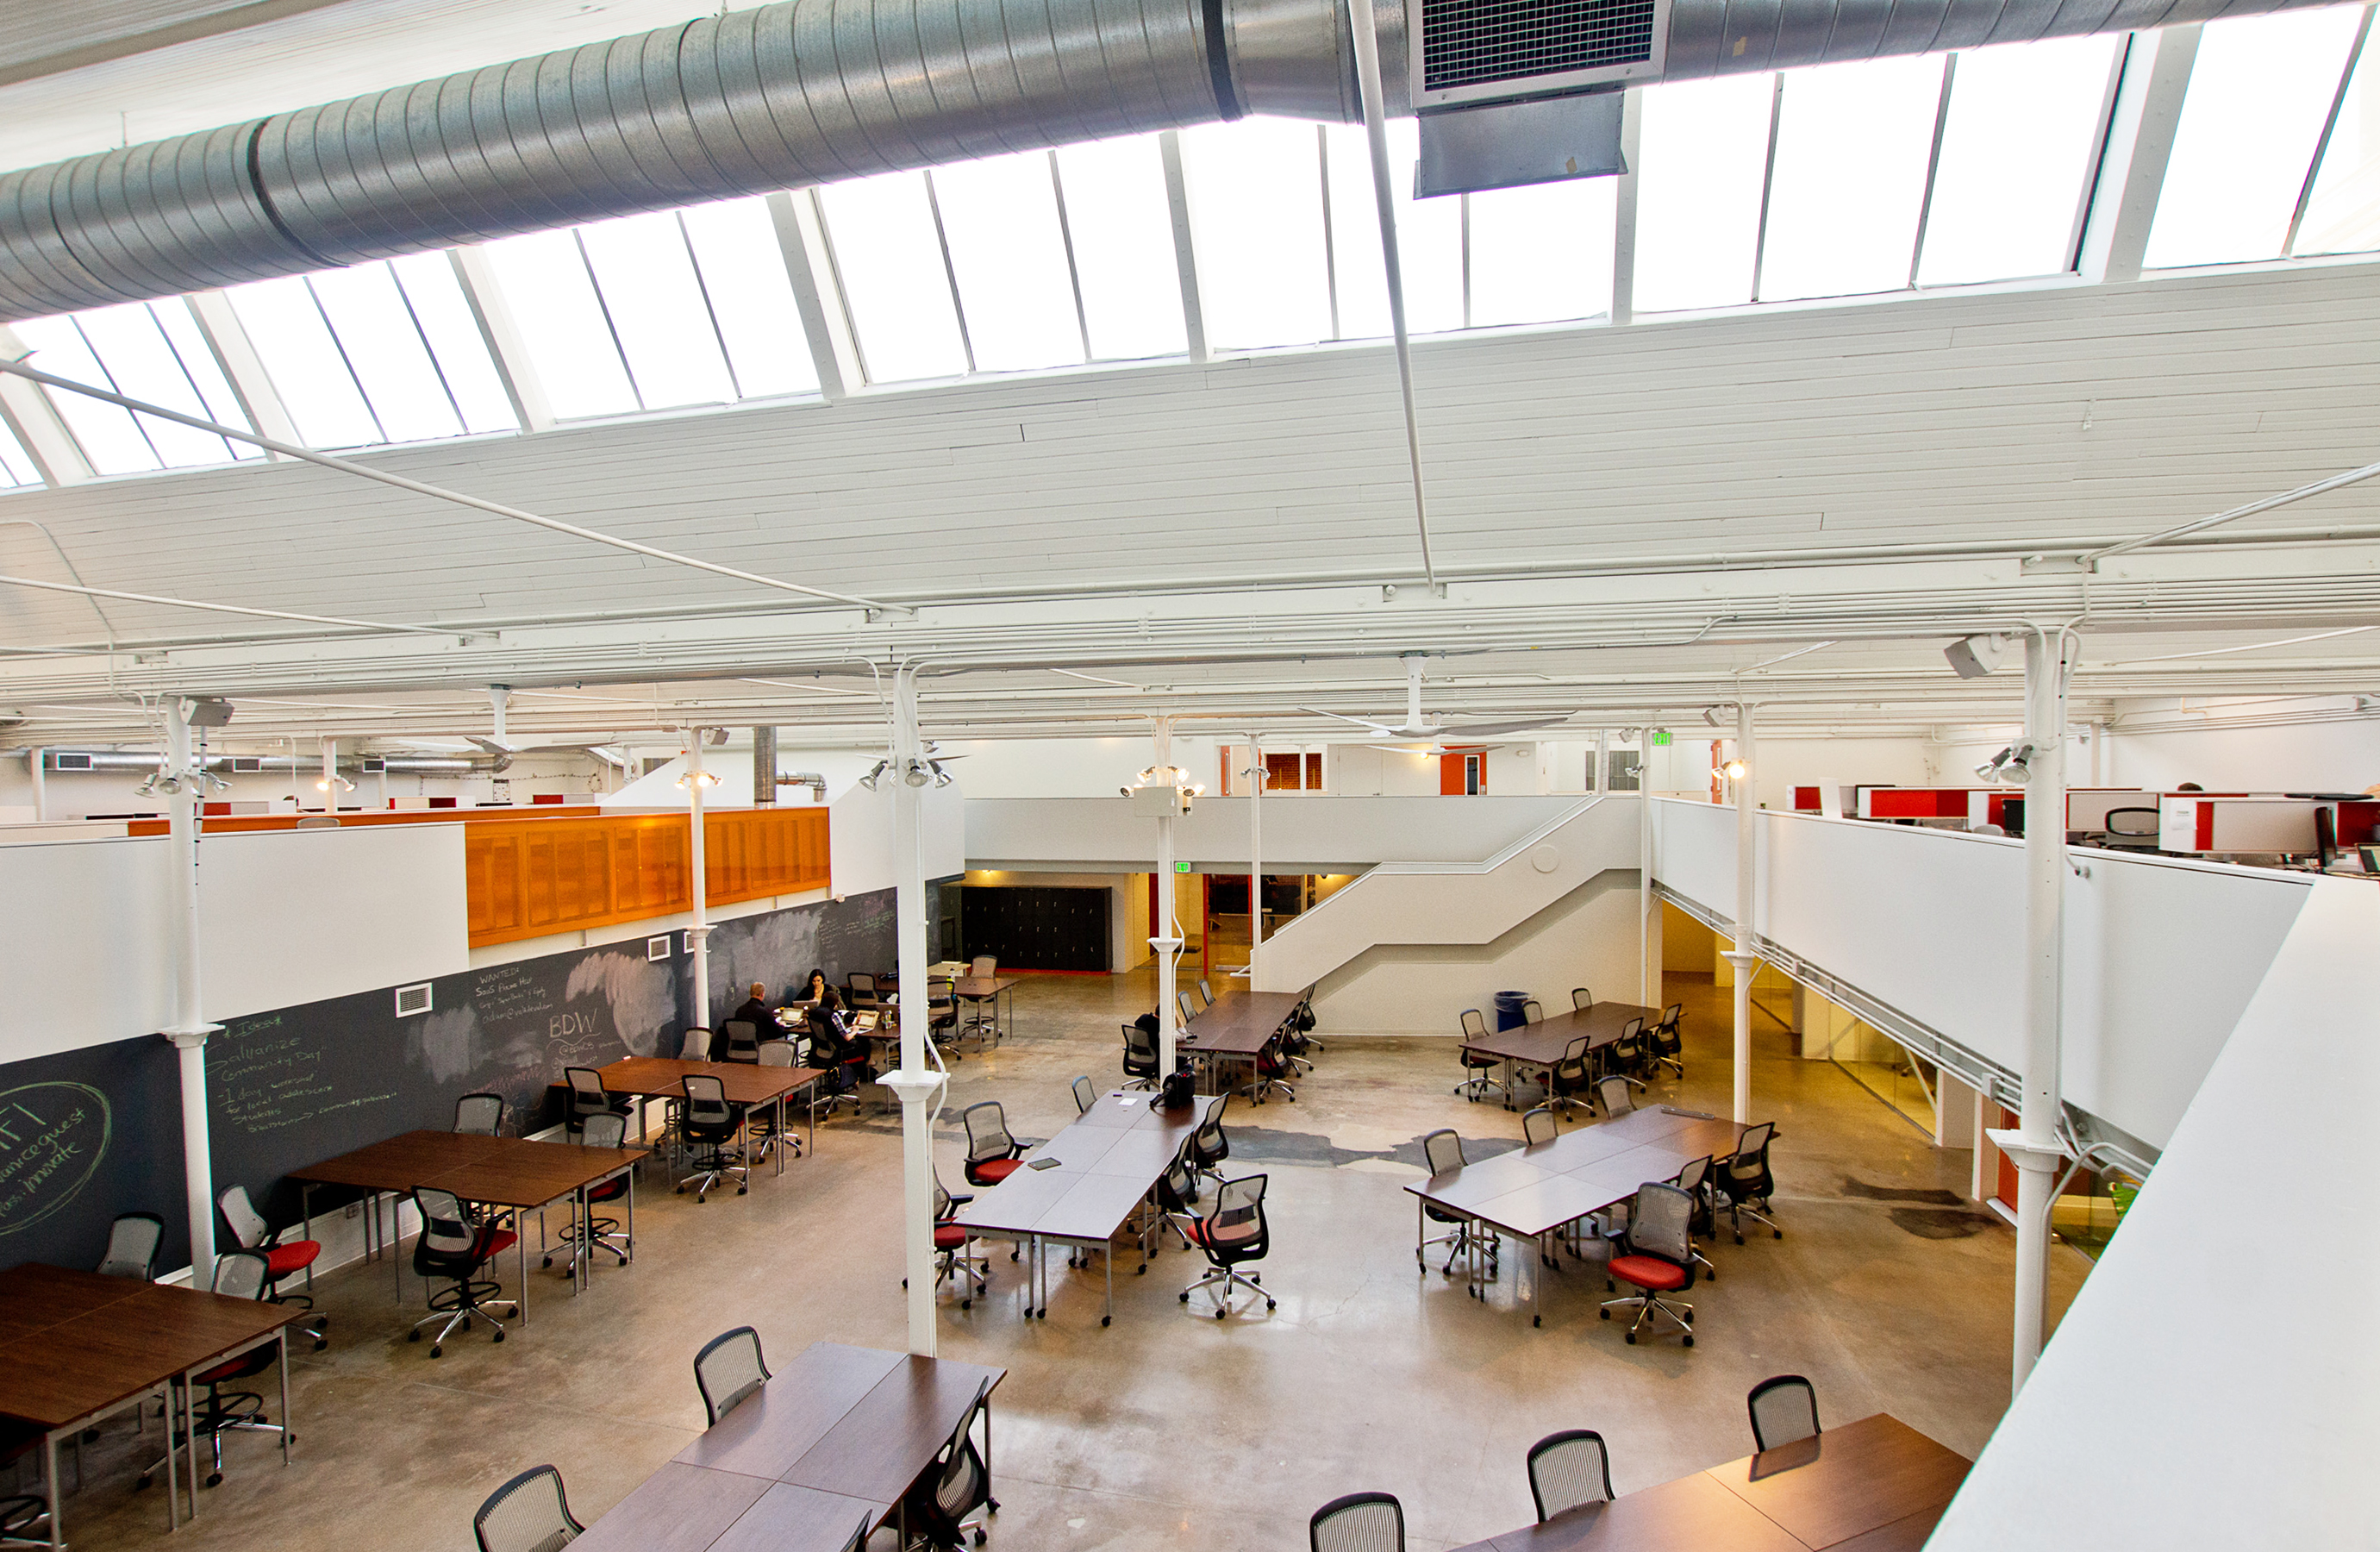 galvanize 1.0 adaptive reuse cowork open studio architecture OSA